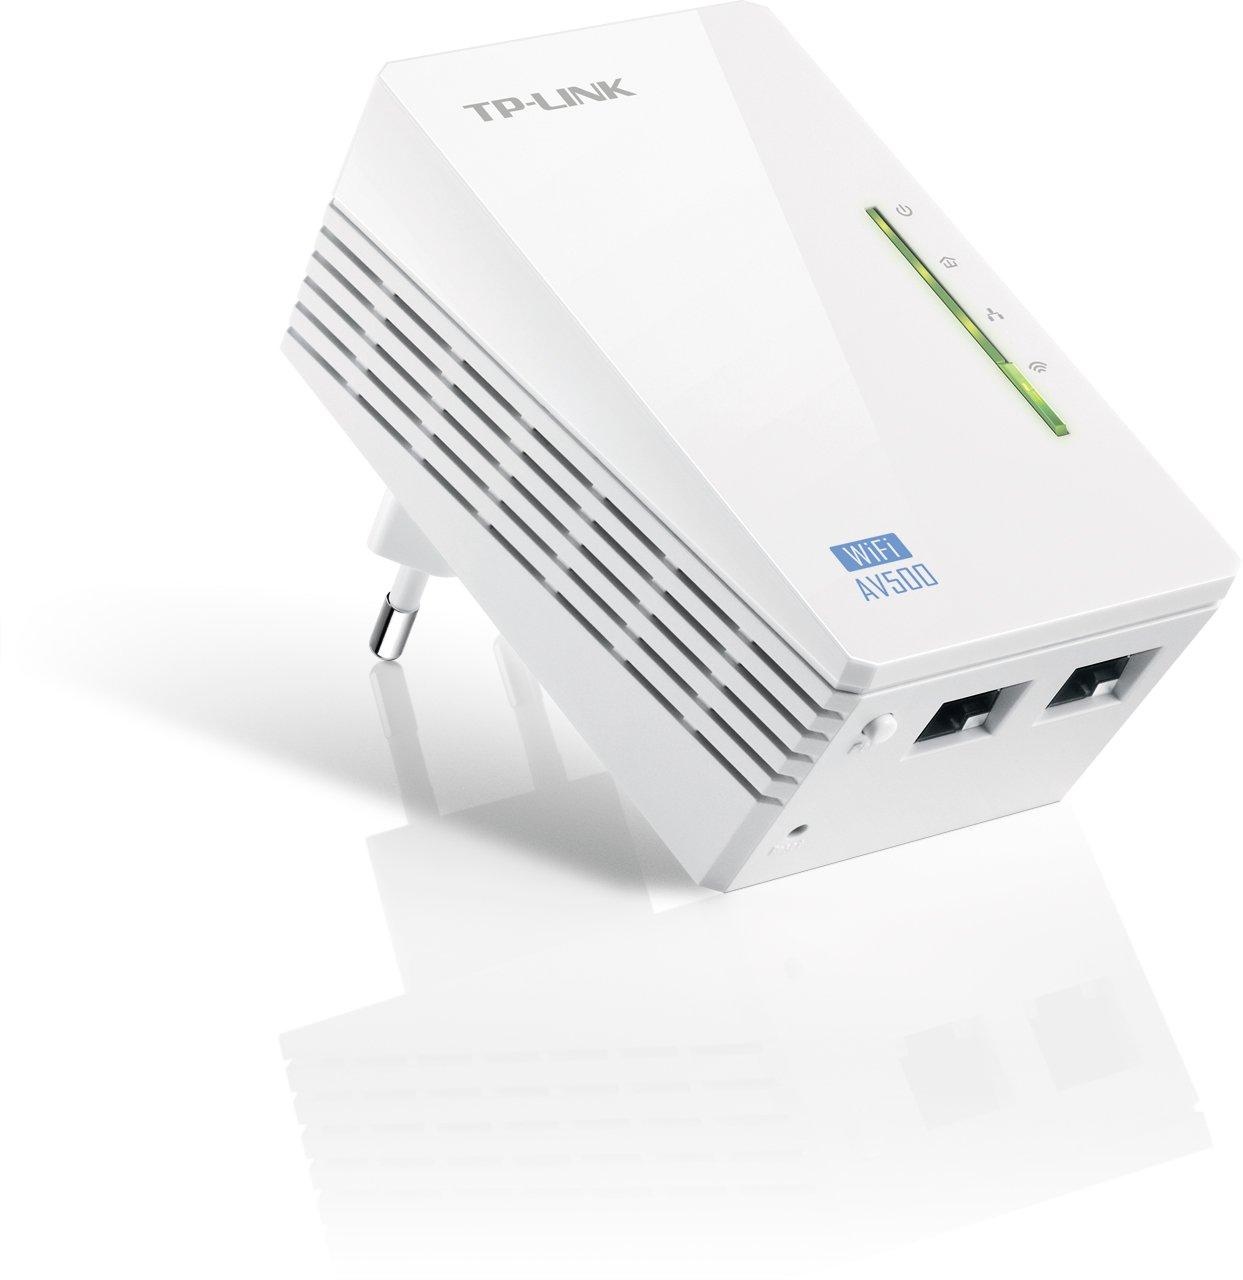 TP LINK TL WPA Extensor de red por línea eléctrica WiFi Mbps